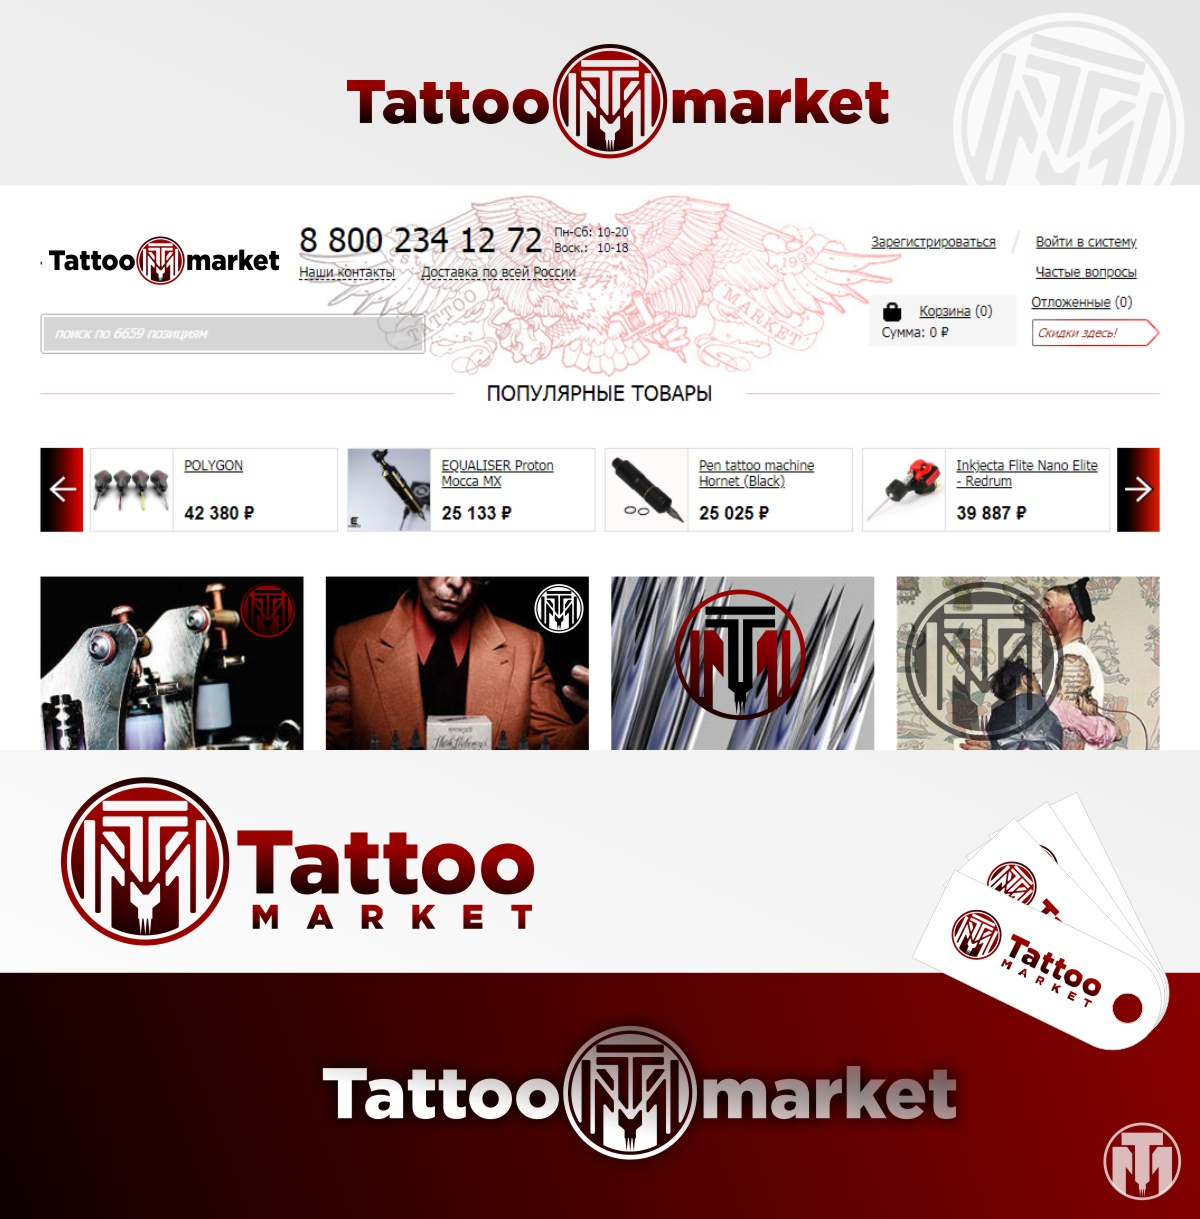 Редизайн логотипа магазина тату оборудования TattooMarket.ru фото f_3715c3a2d6785c61.jpg